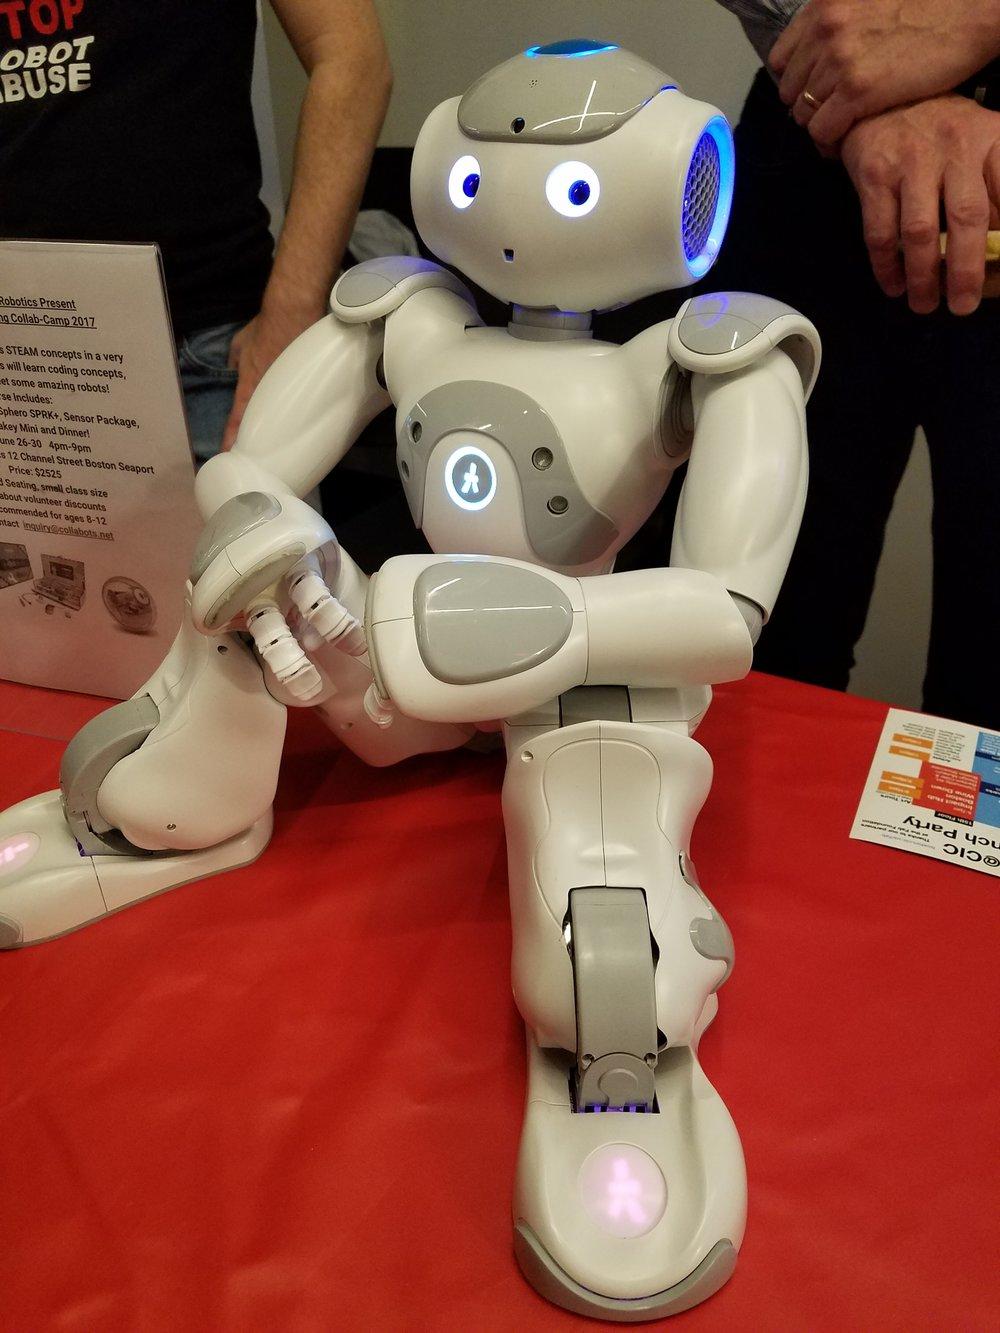 Mass Robotics